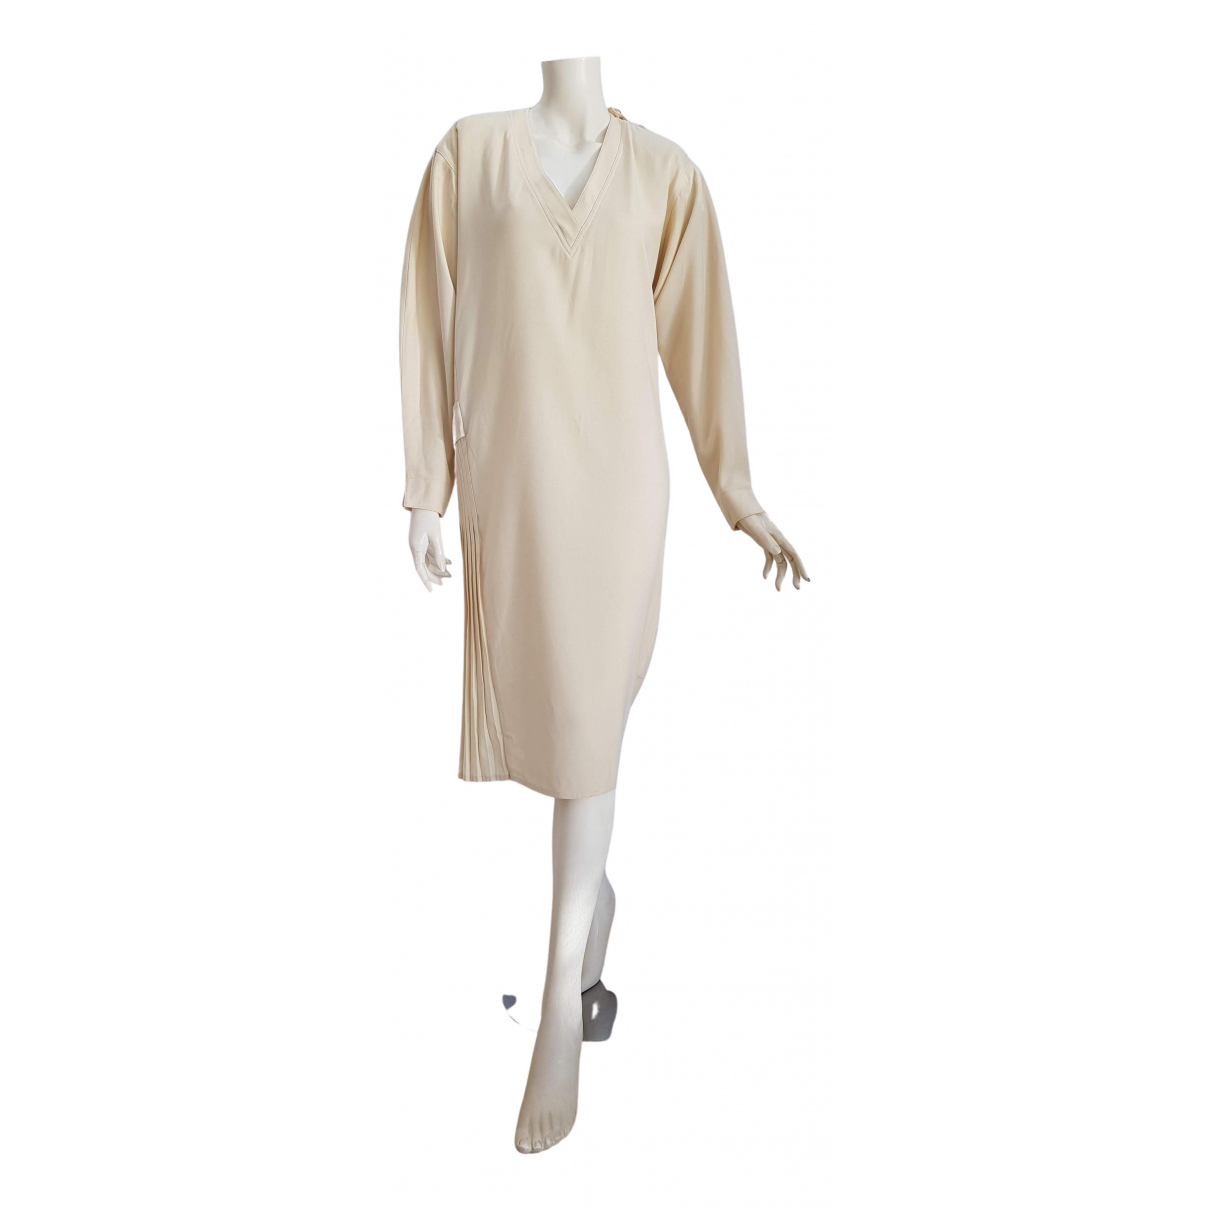 Gianfranco Ferre \N Kleid in  Beige Wolle